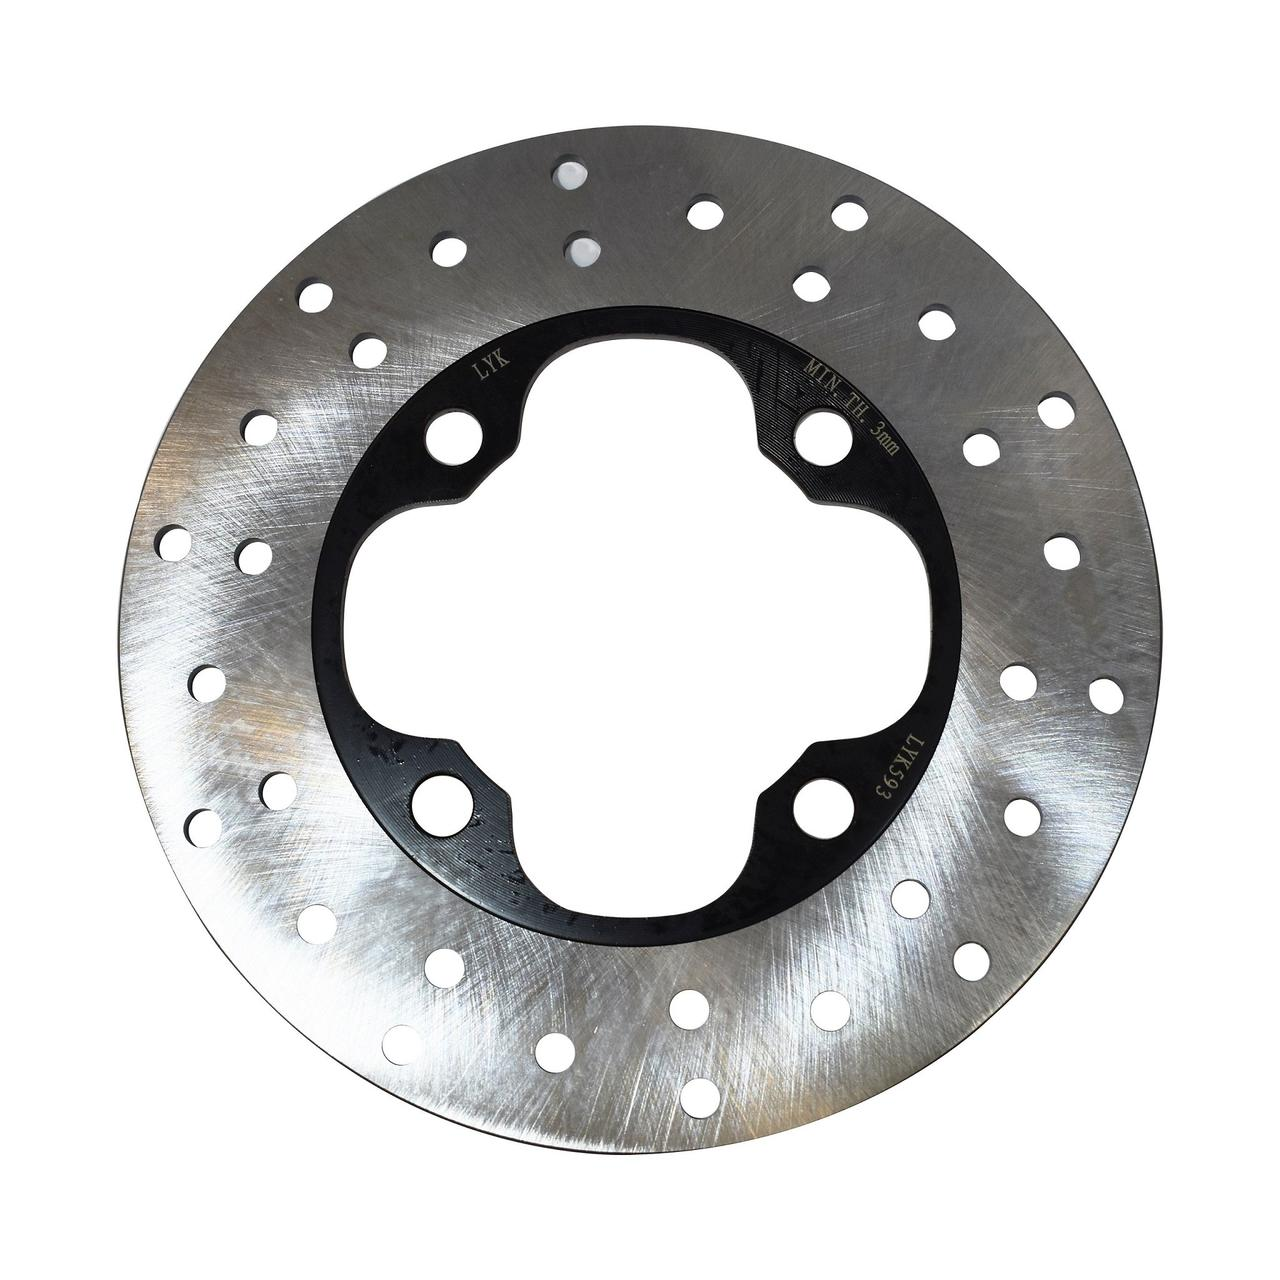 Тормозной диск Honda TRX 420 500 (OEM 45251-HR6-A61; OEM 45251-HR3-A21)